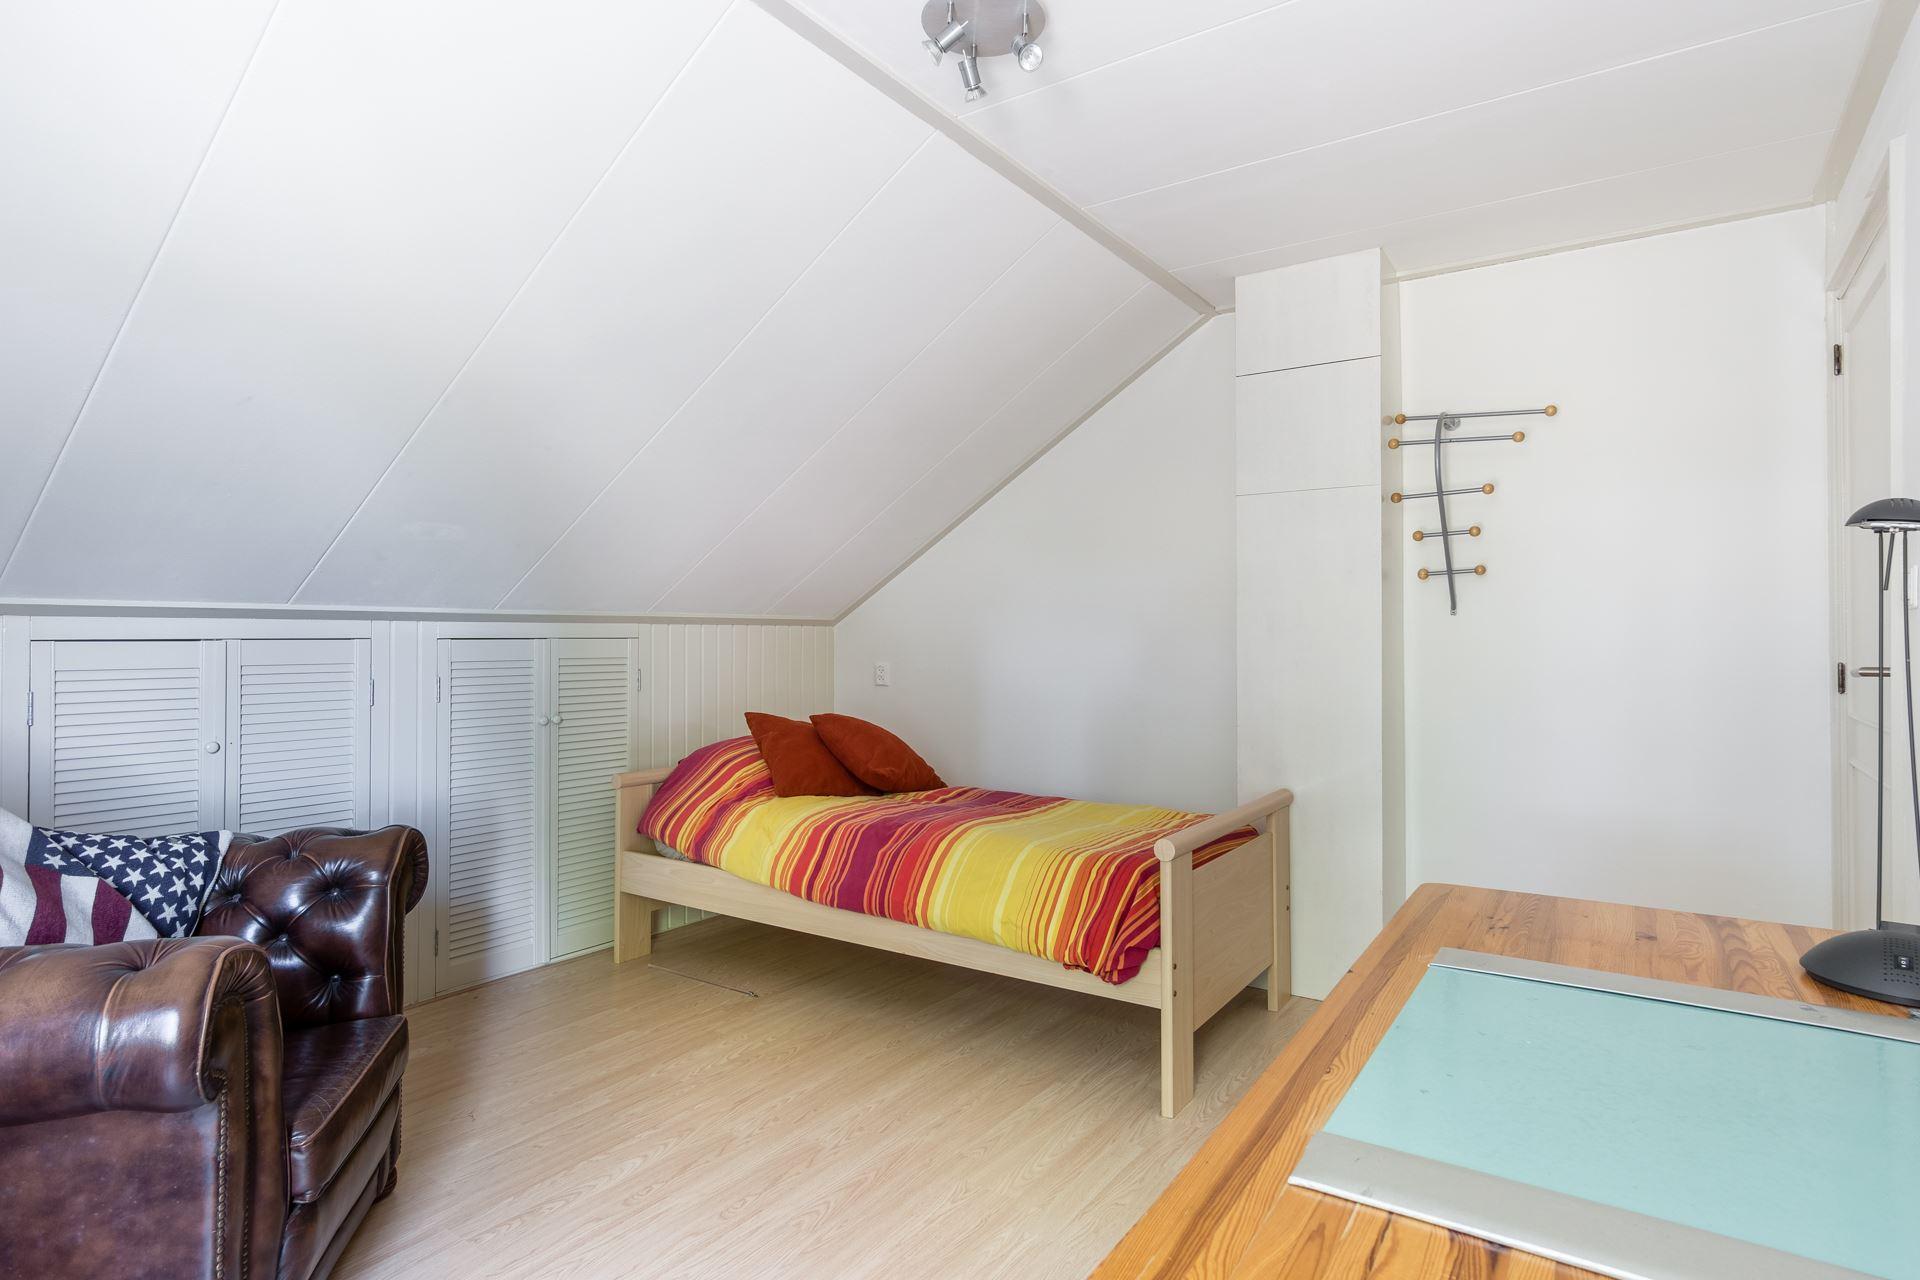 Huis te koop: zuider kreekweg 2 a 4661 pc halsteren [funda]